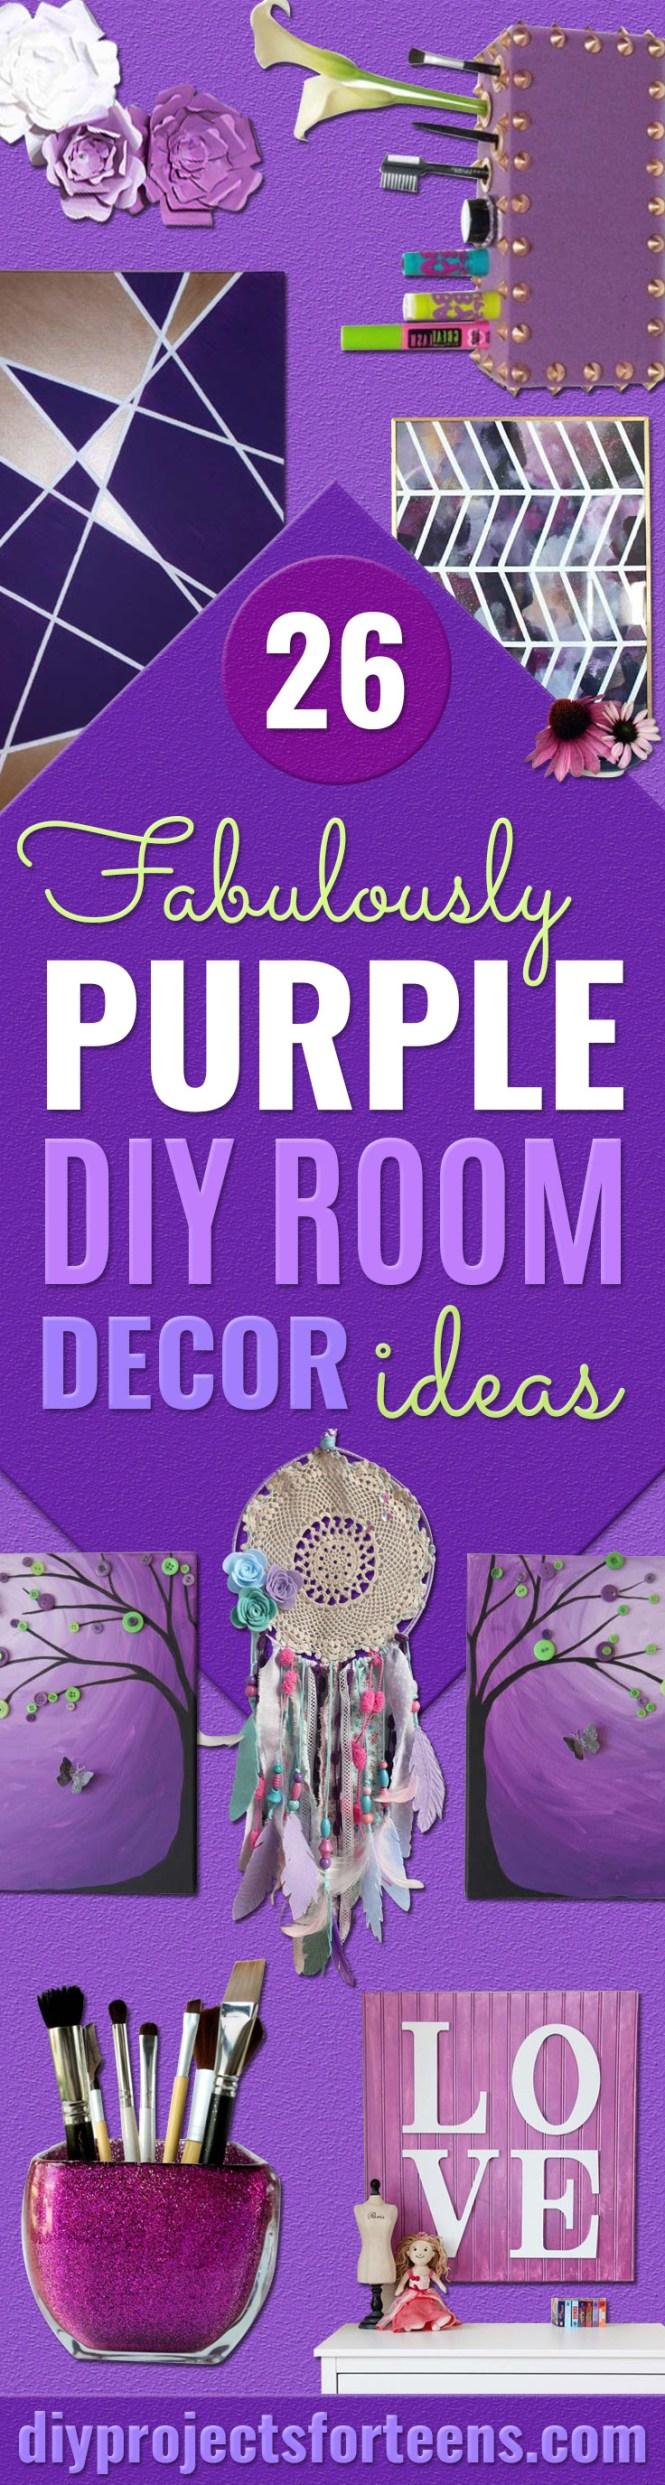 Beautiful Purple Bedroom Decor Ideas And Decorating Walls Home Pleasant